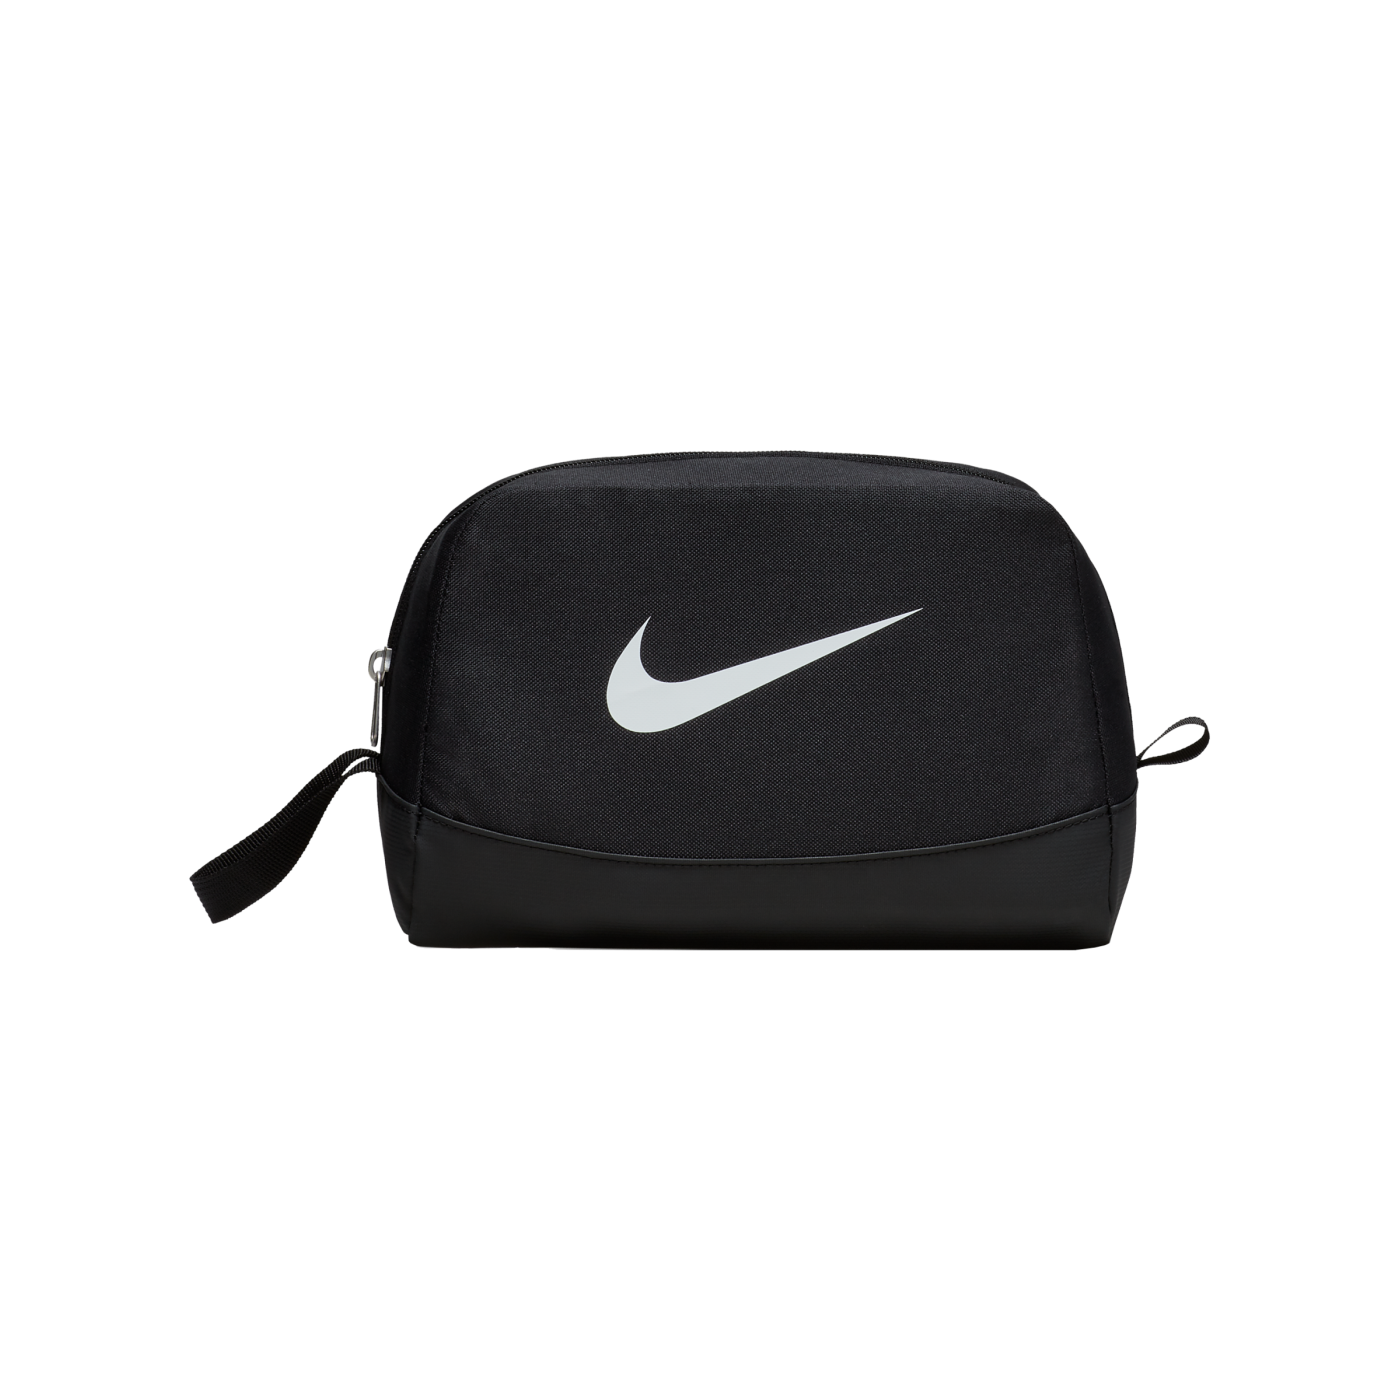 Nike Club Team Swoosh Toiletry Bag Tasche F010